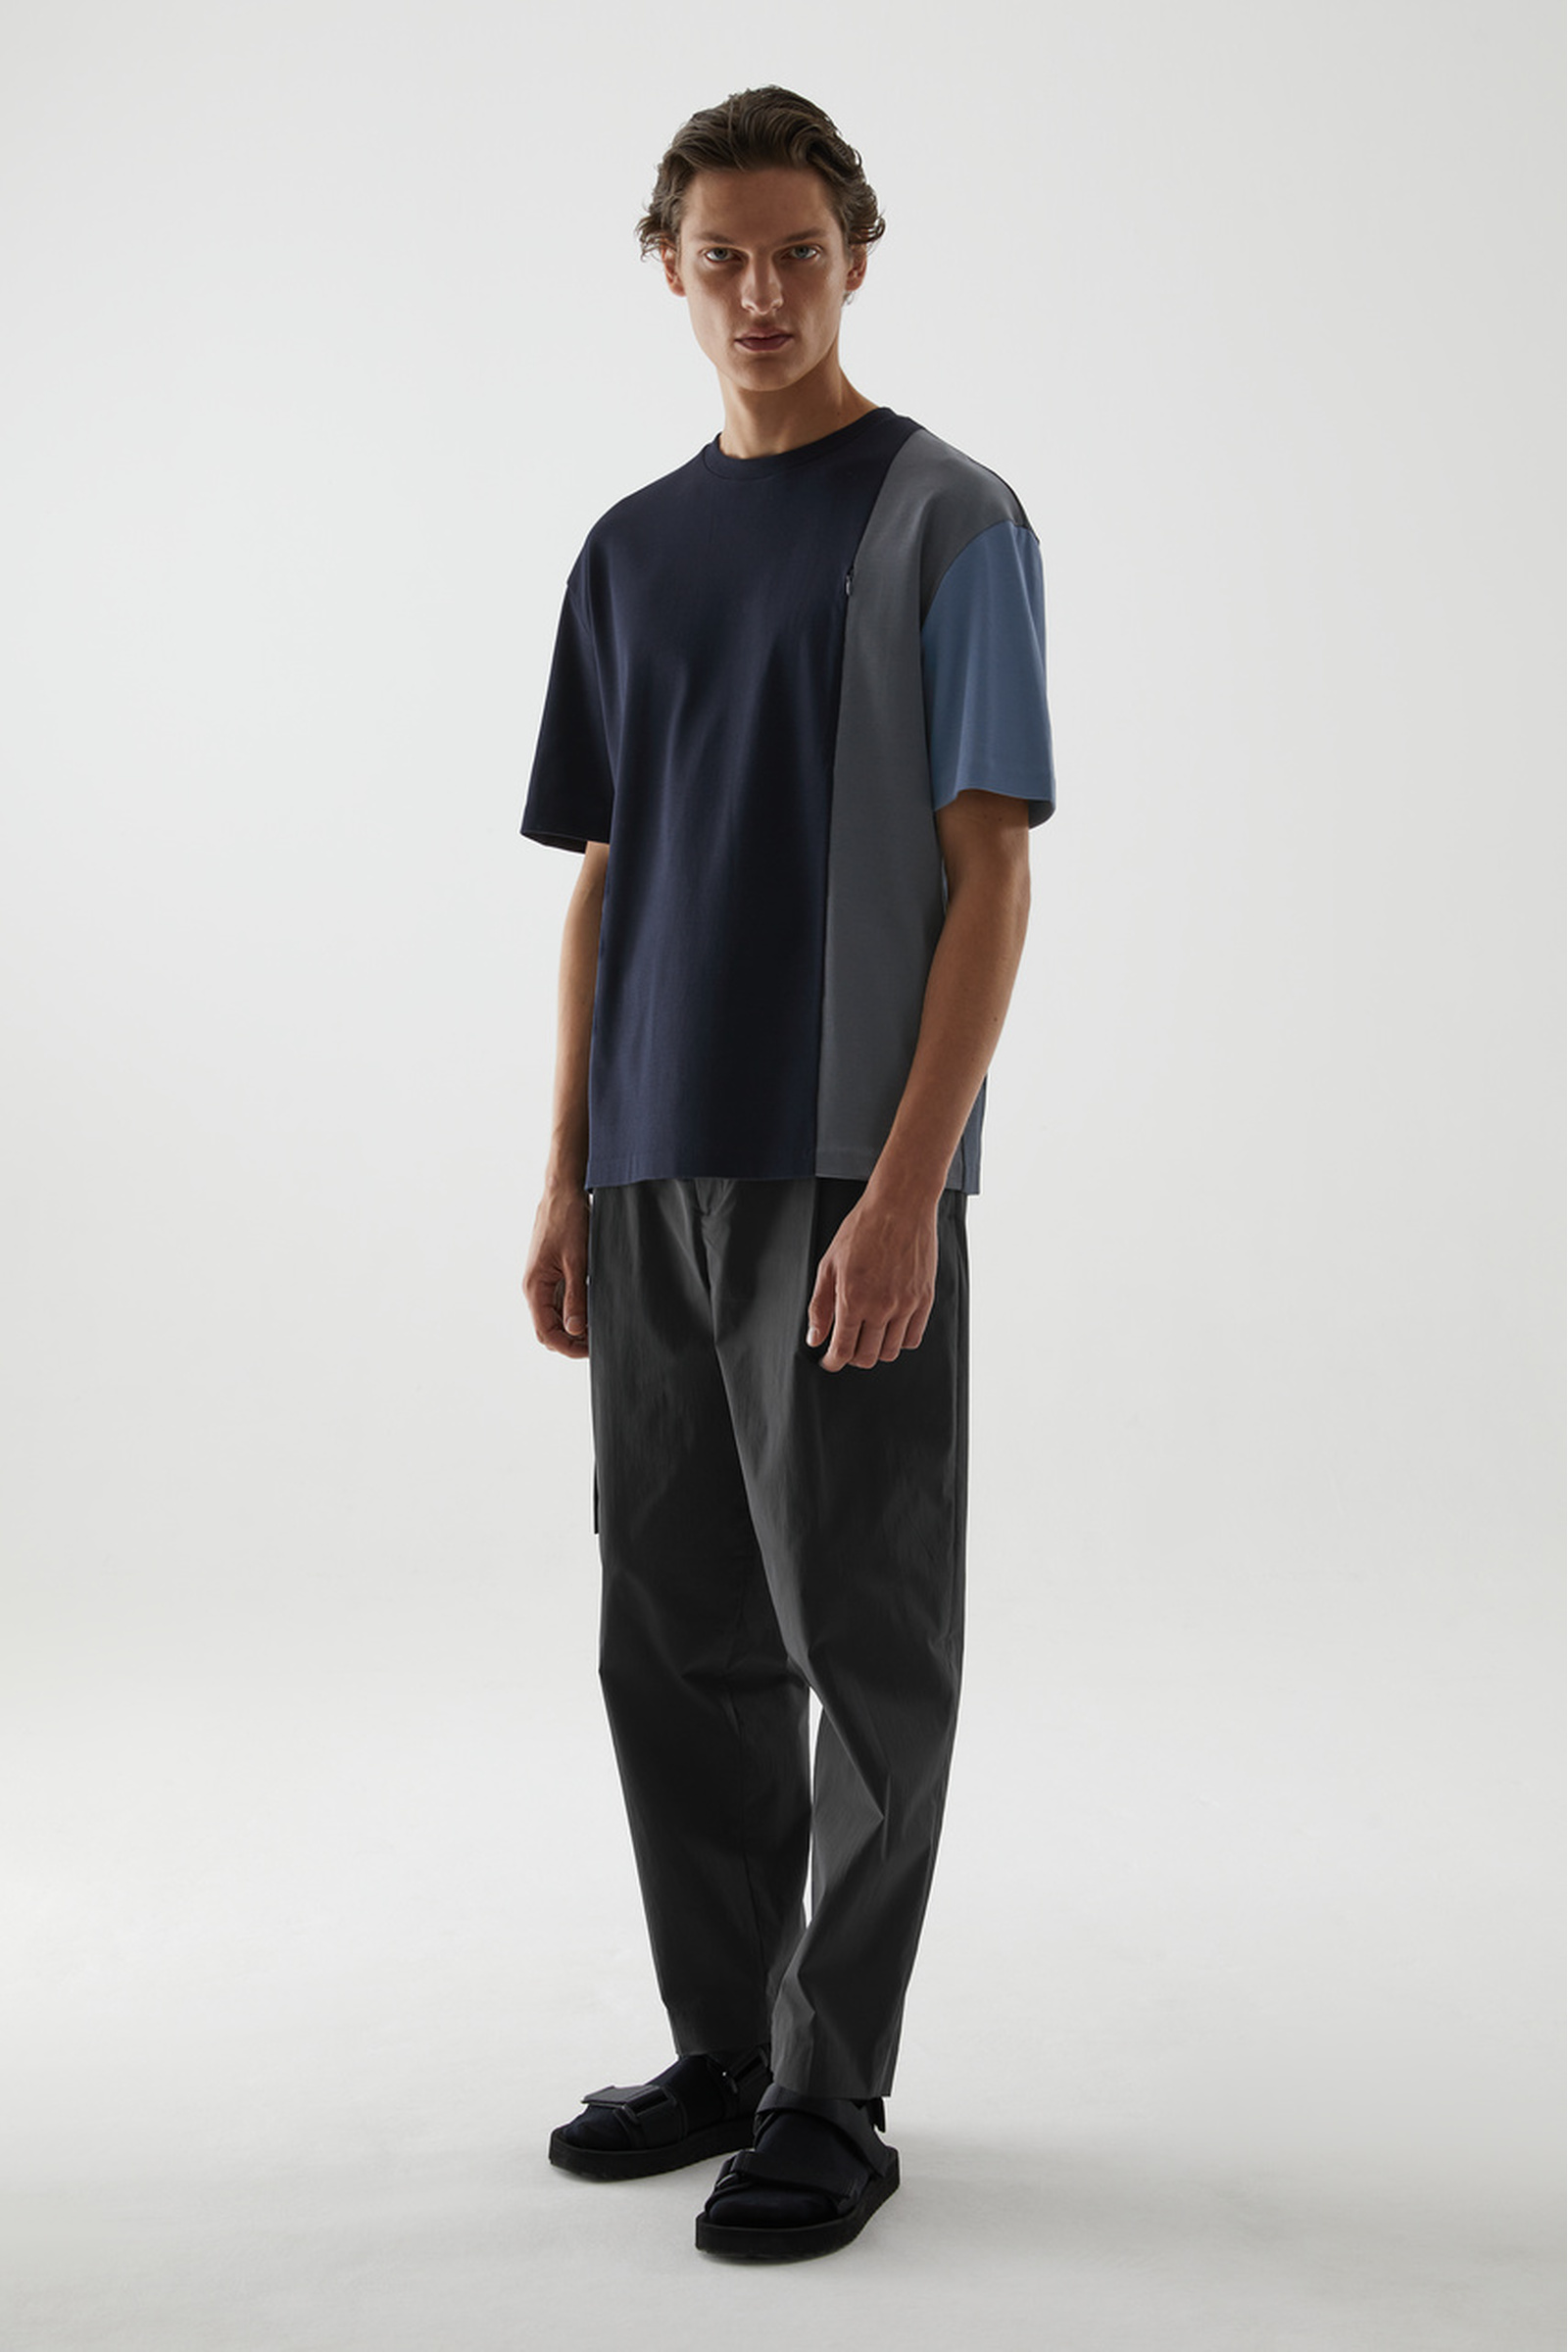 COS 코튼 패널드 티셔츠의 네이비 / 블루 / 그레이컬러 ECOMLook입니다.